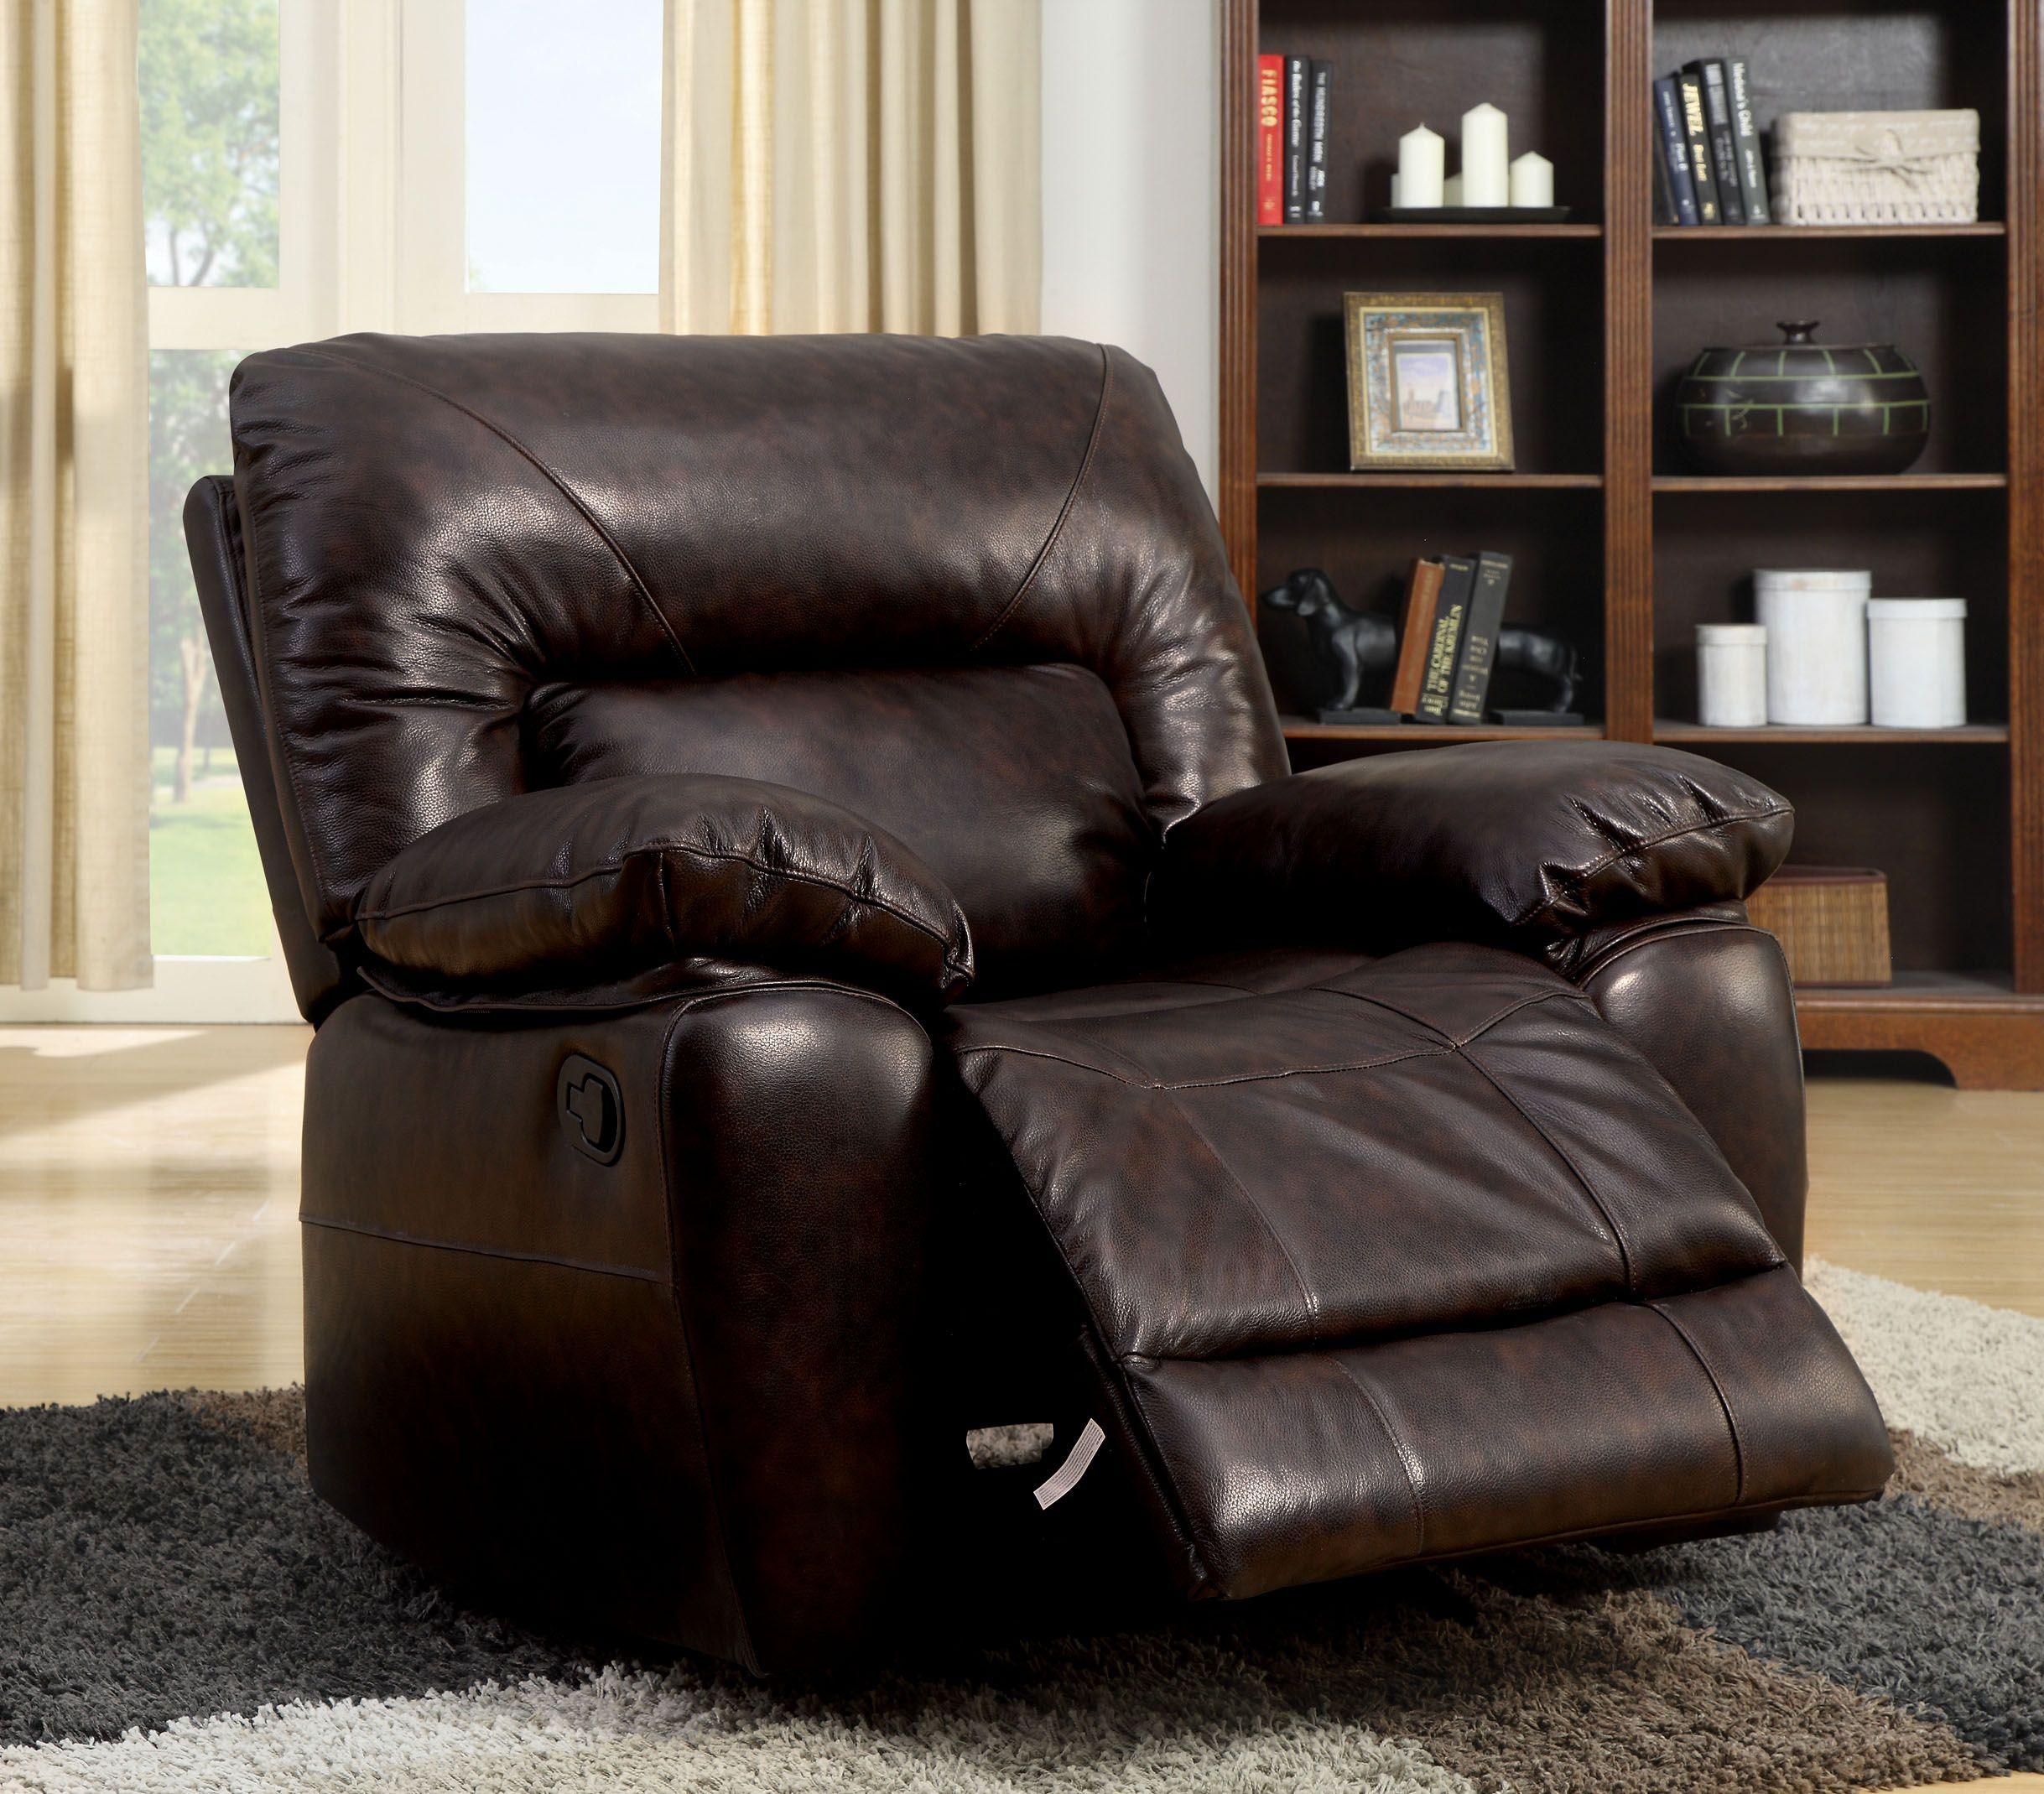 Furniture of america dark brown doran top grain leather